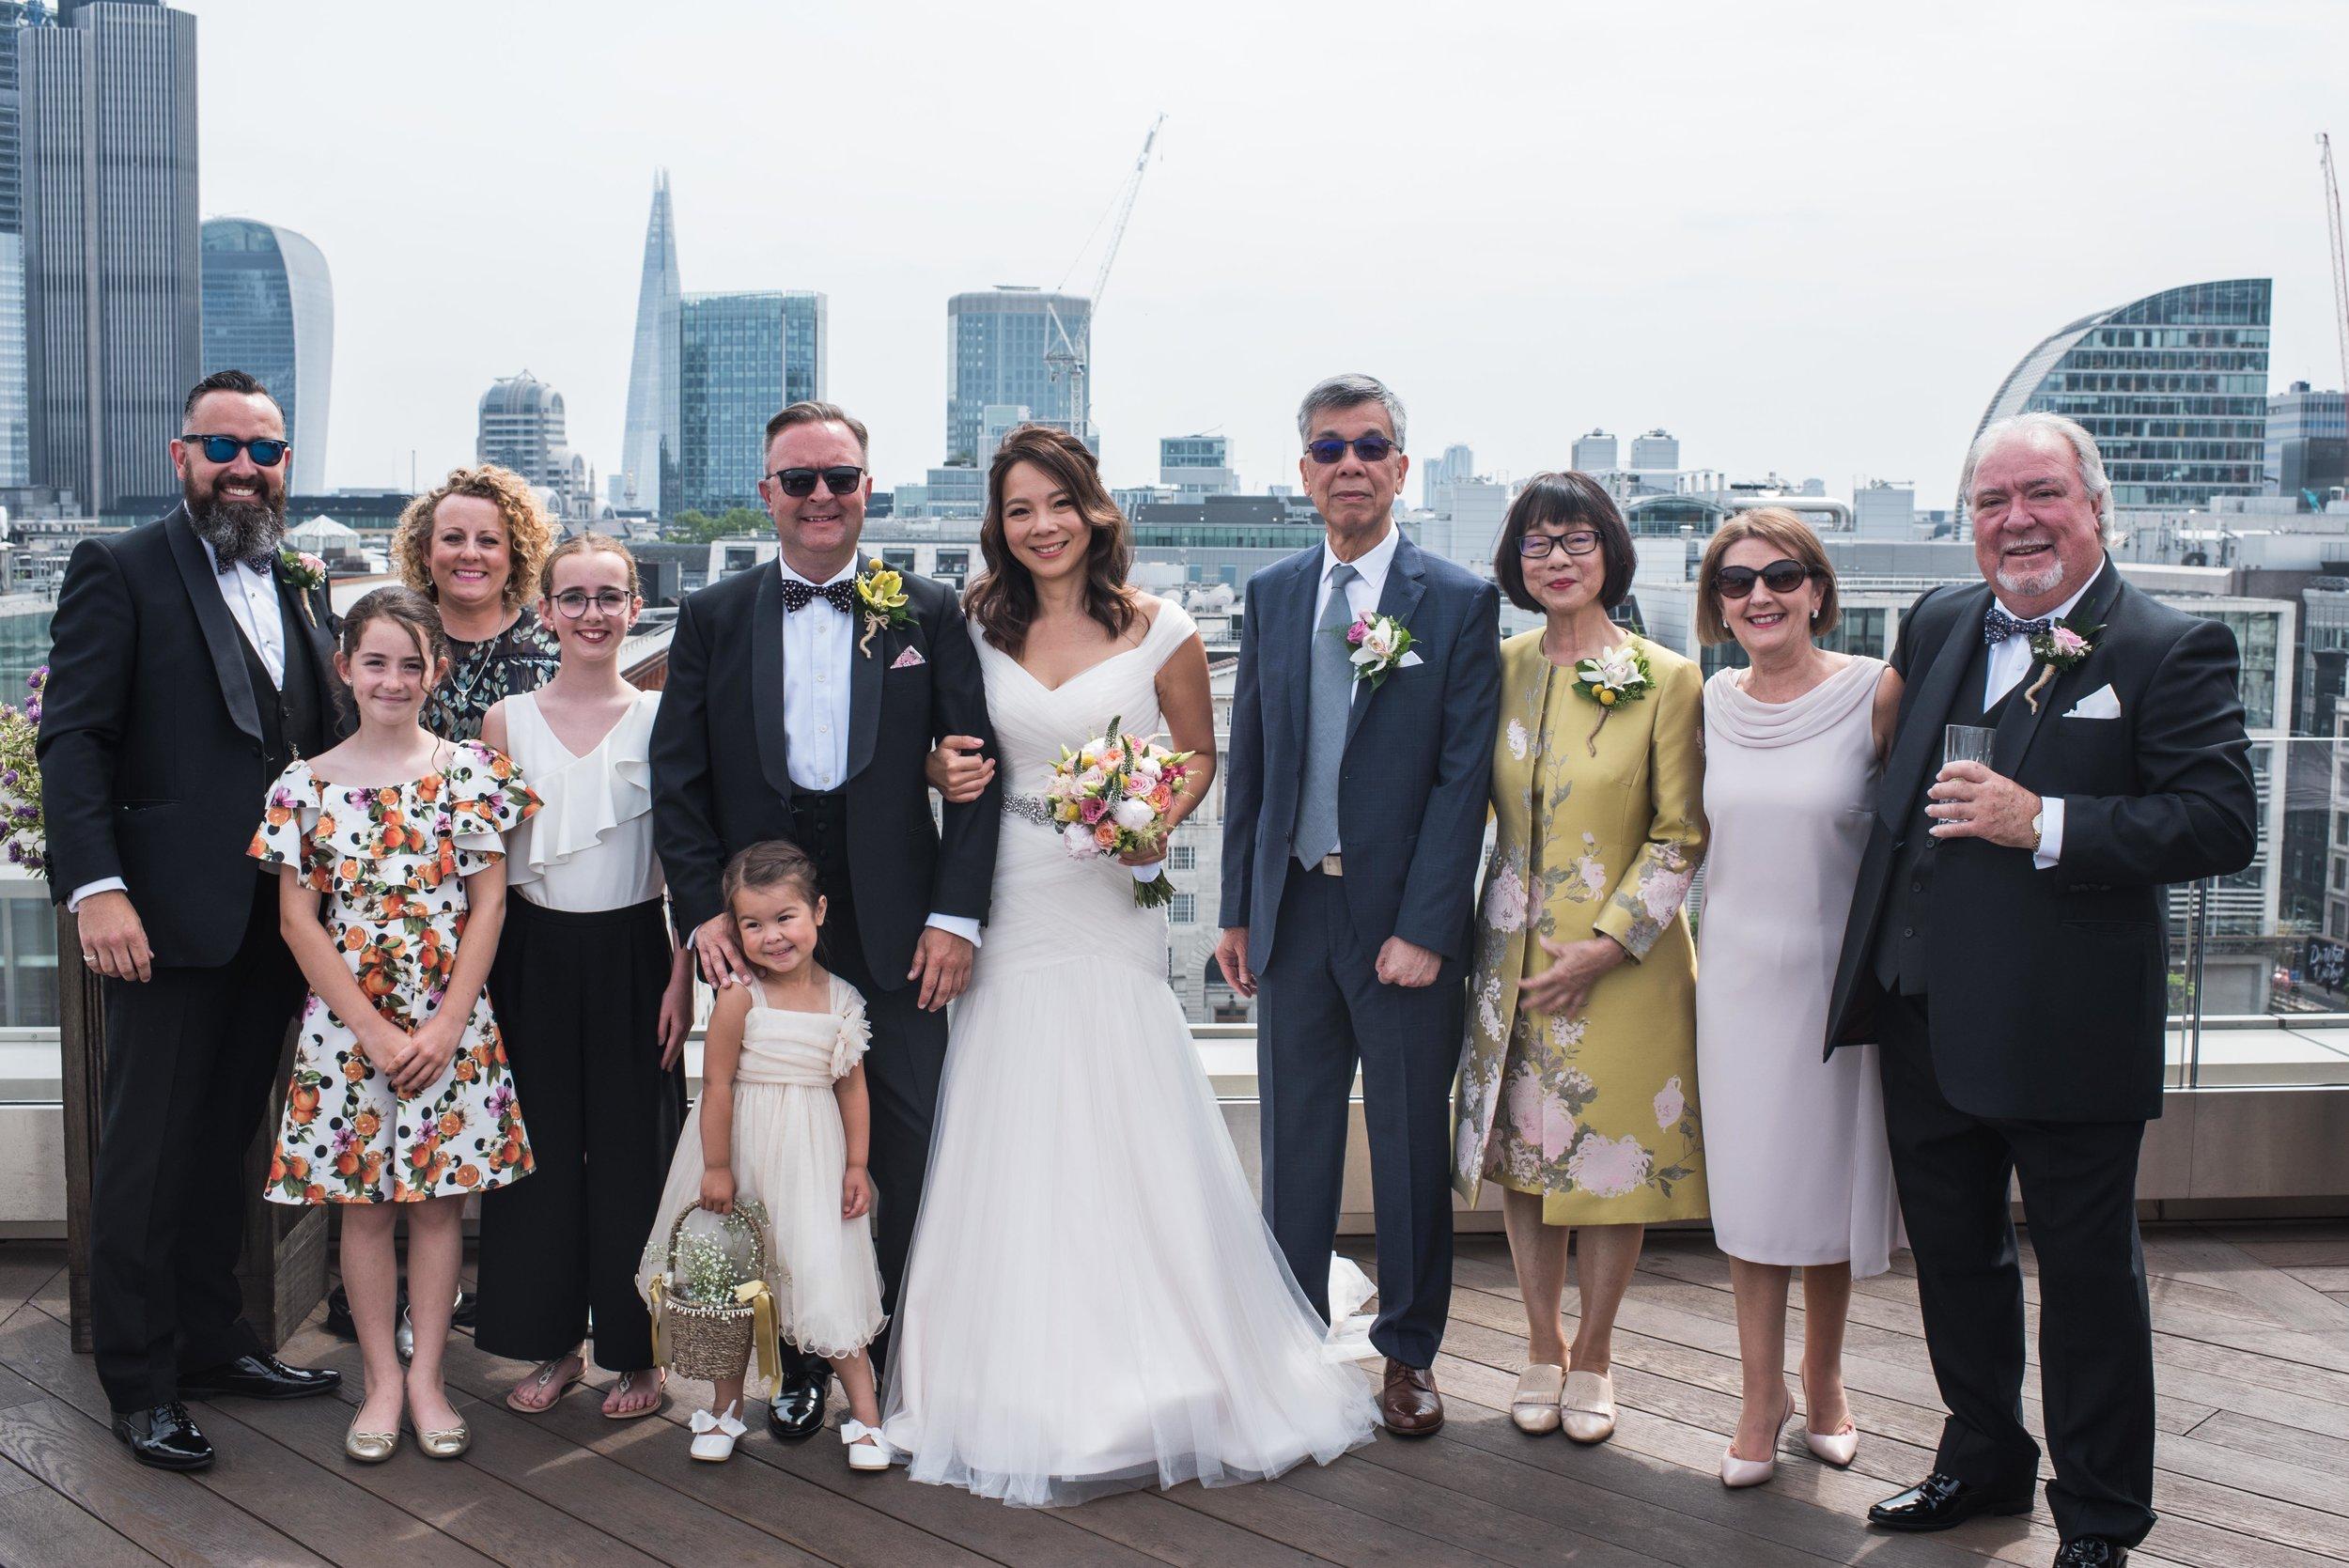 D&M_Marylebone Town Hall Wedding (33 of 239).jpg